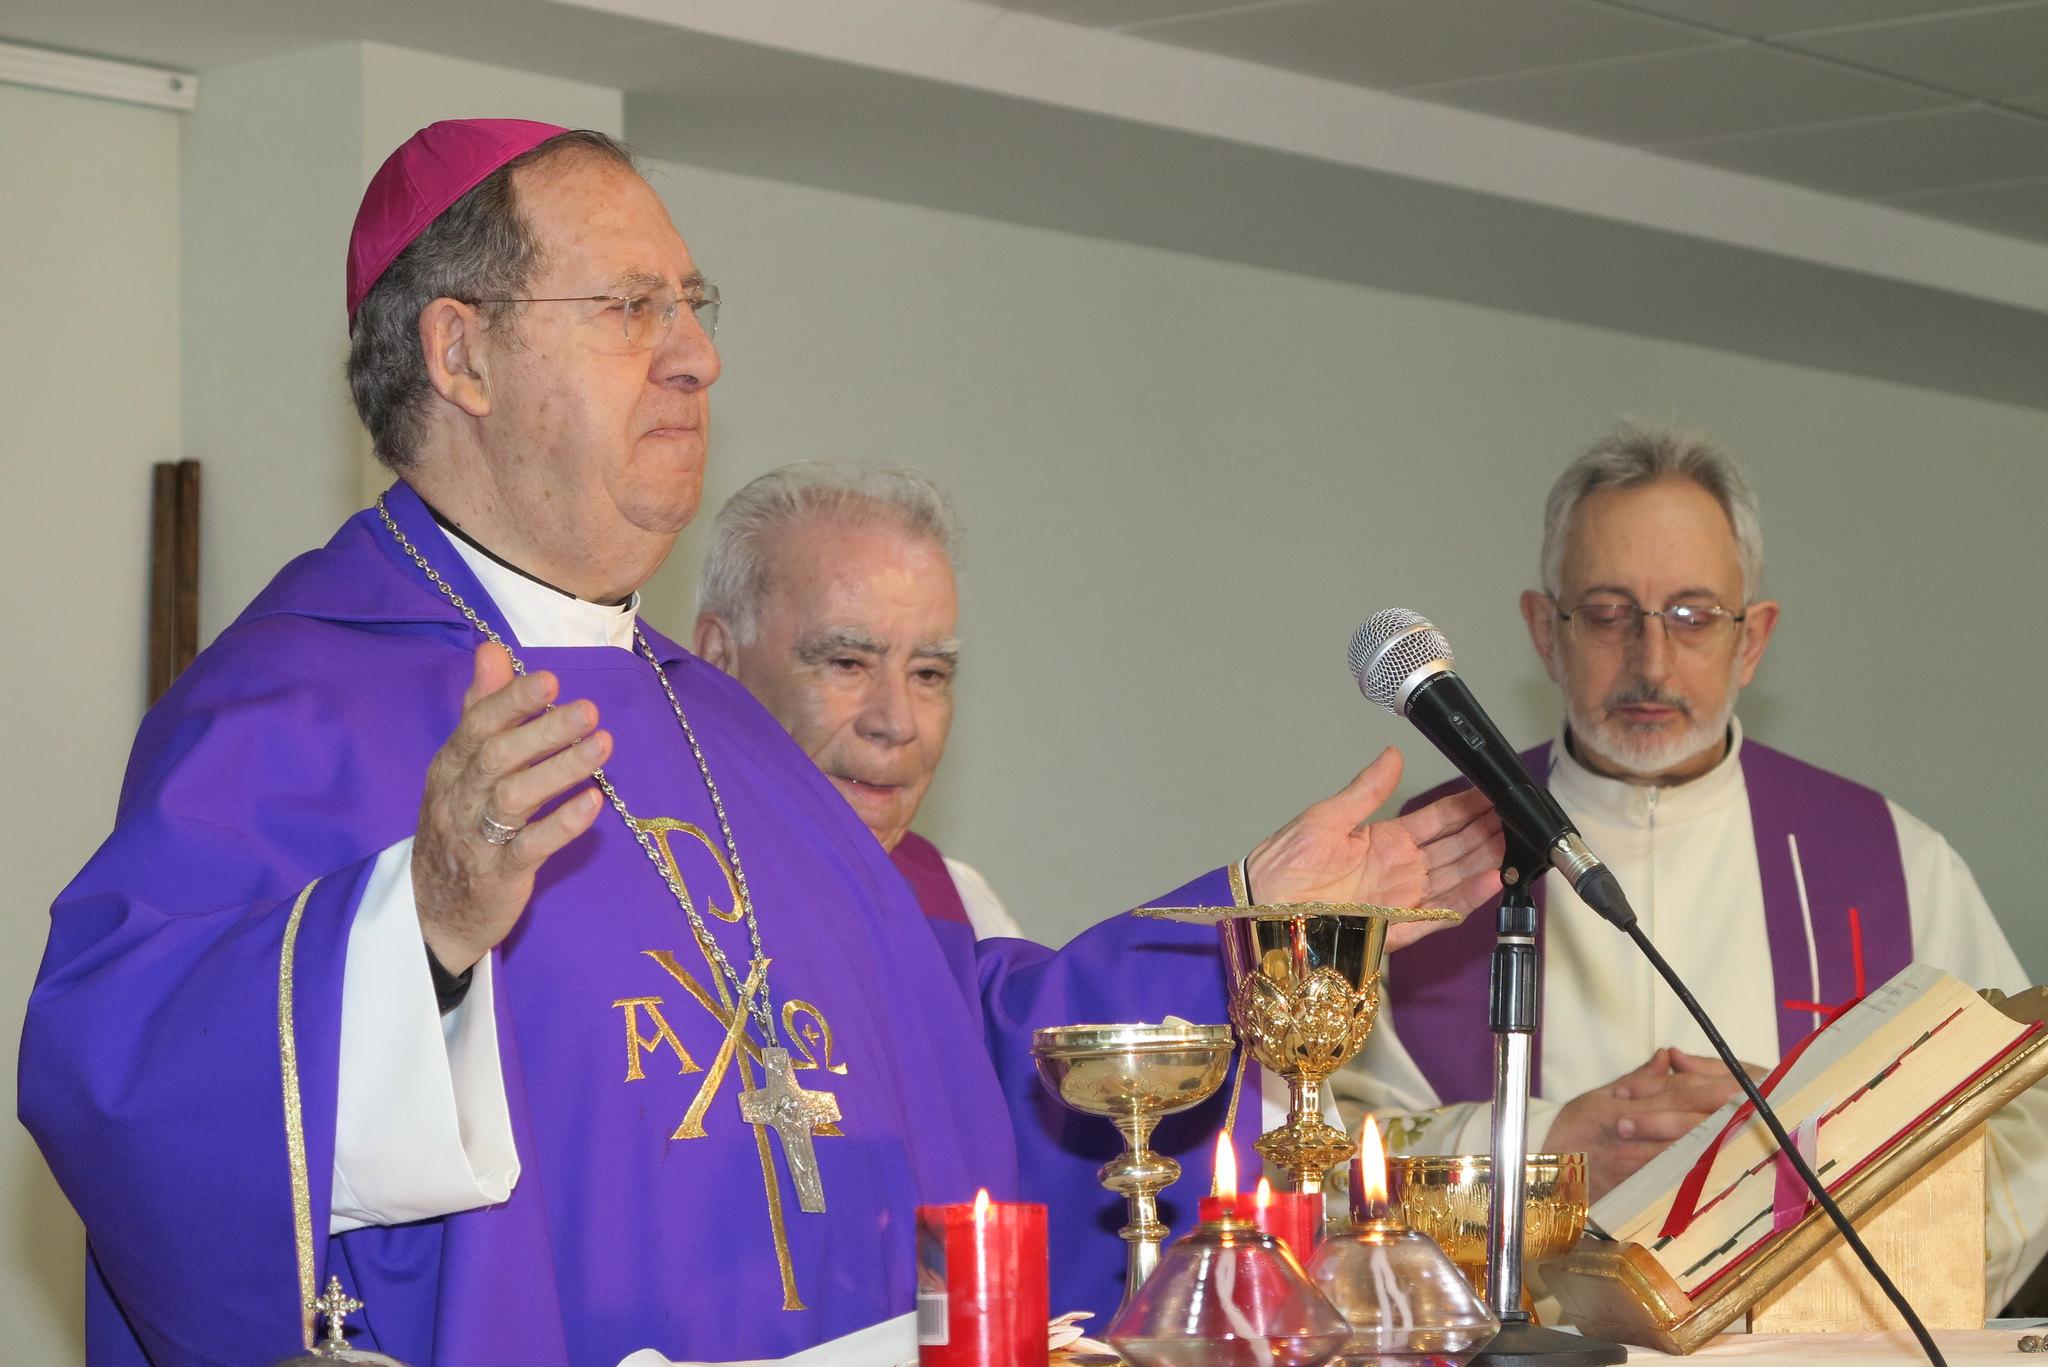 (2016-02-13) - Inauguración Virgen de Lourdes, La Molineta - Archivo La Molineta 2 (30)